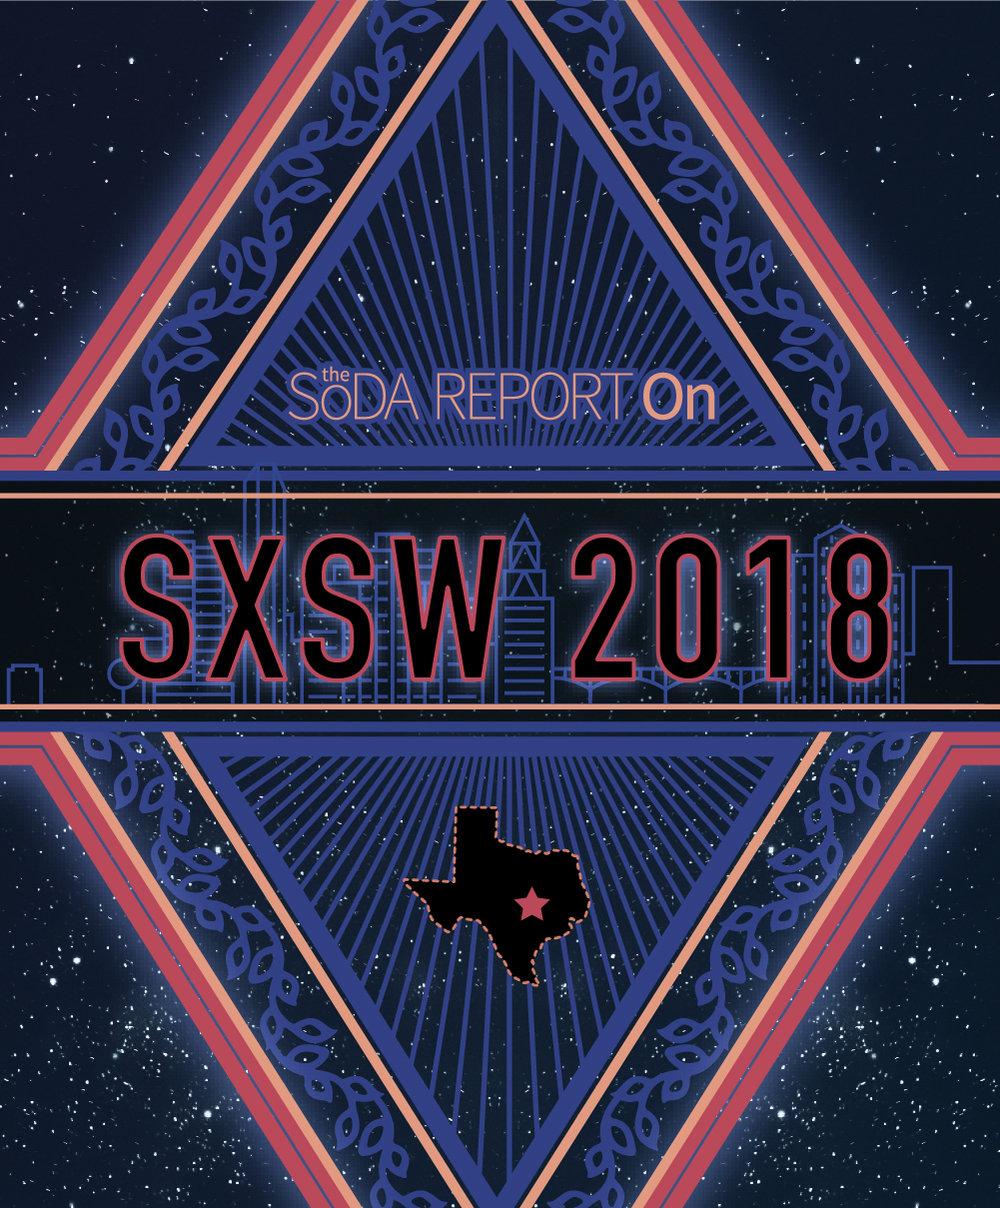 TSR SXSW 2018 Cover.jpg